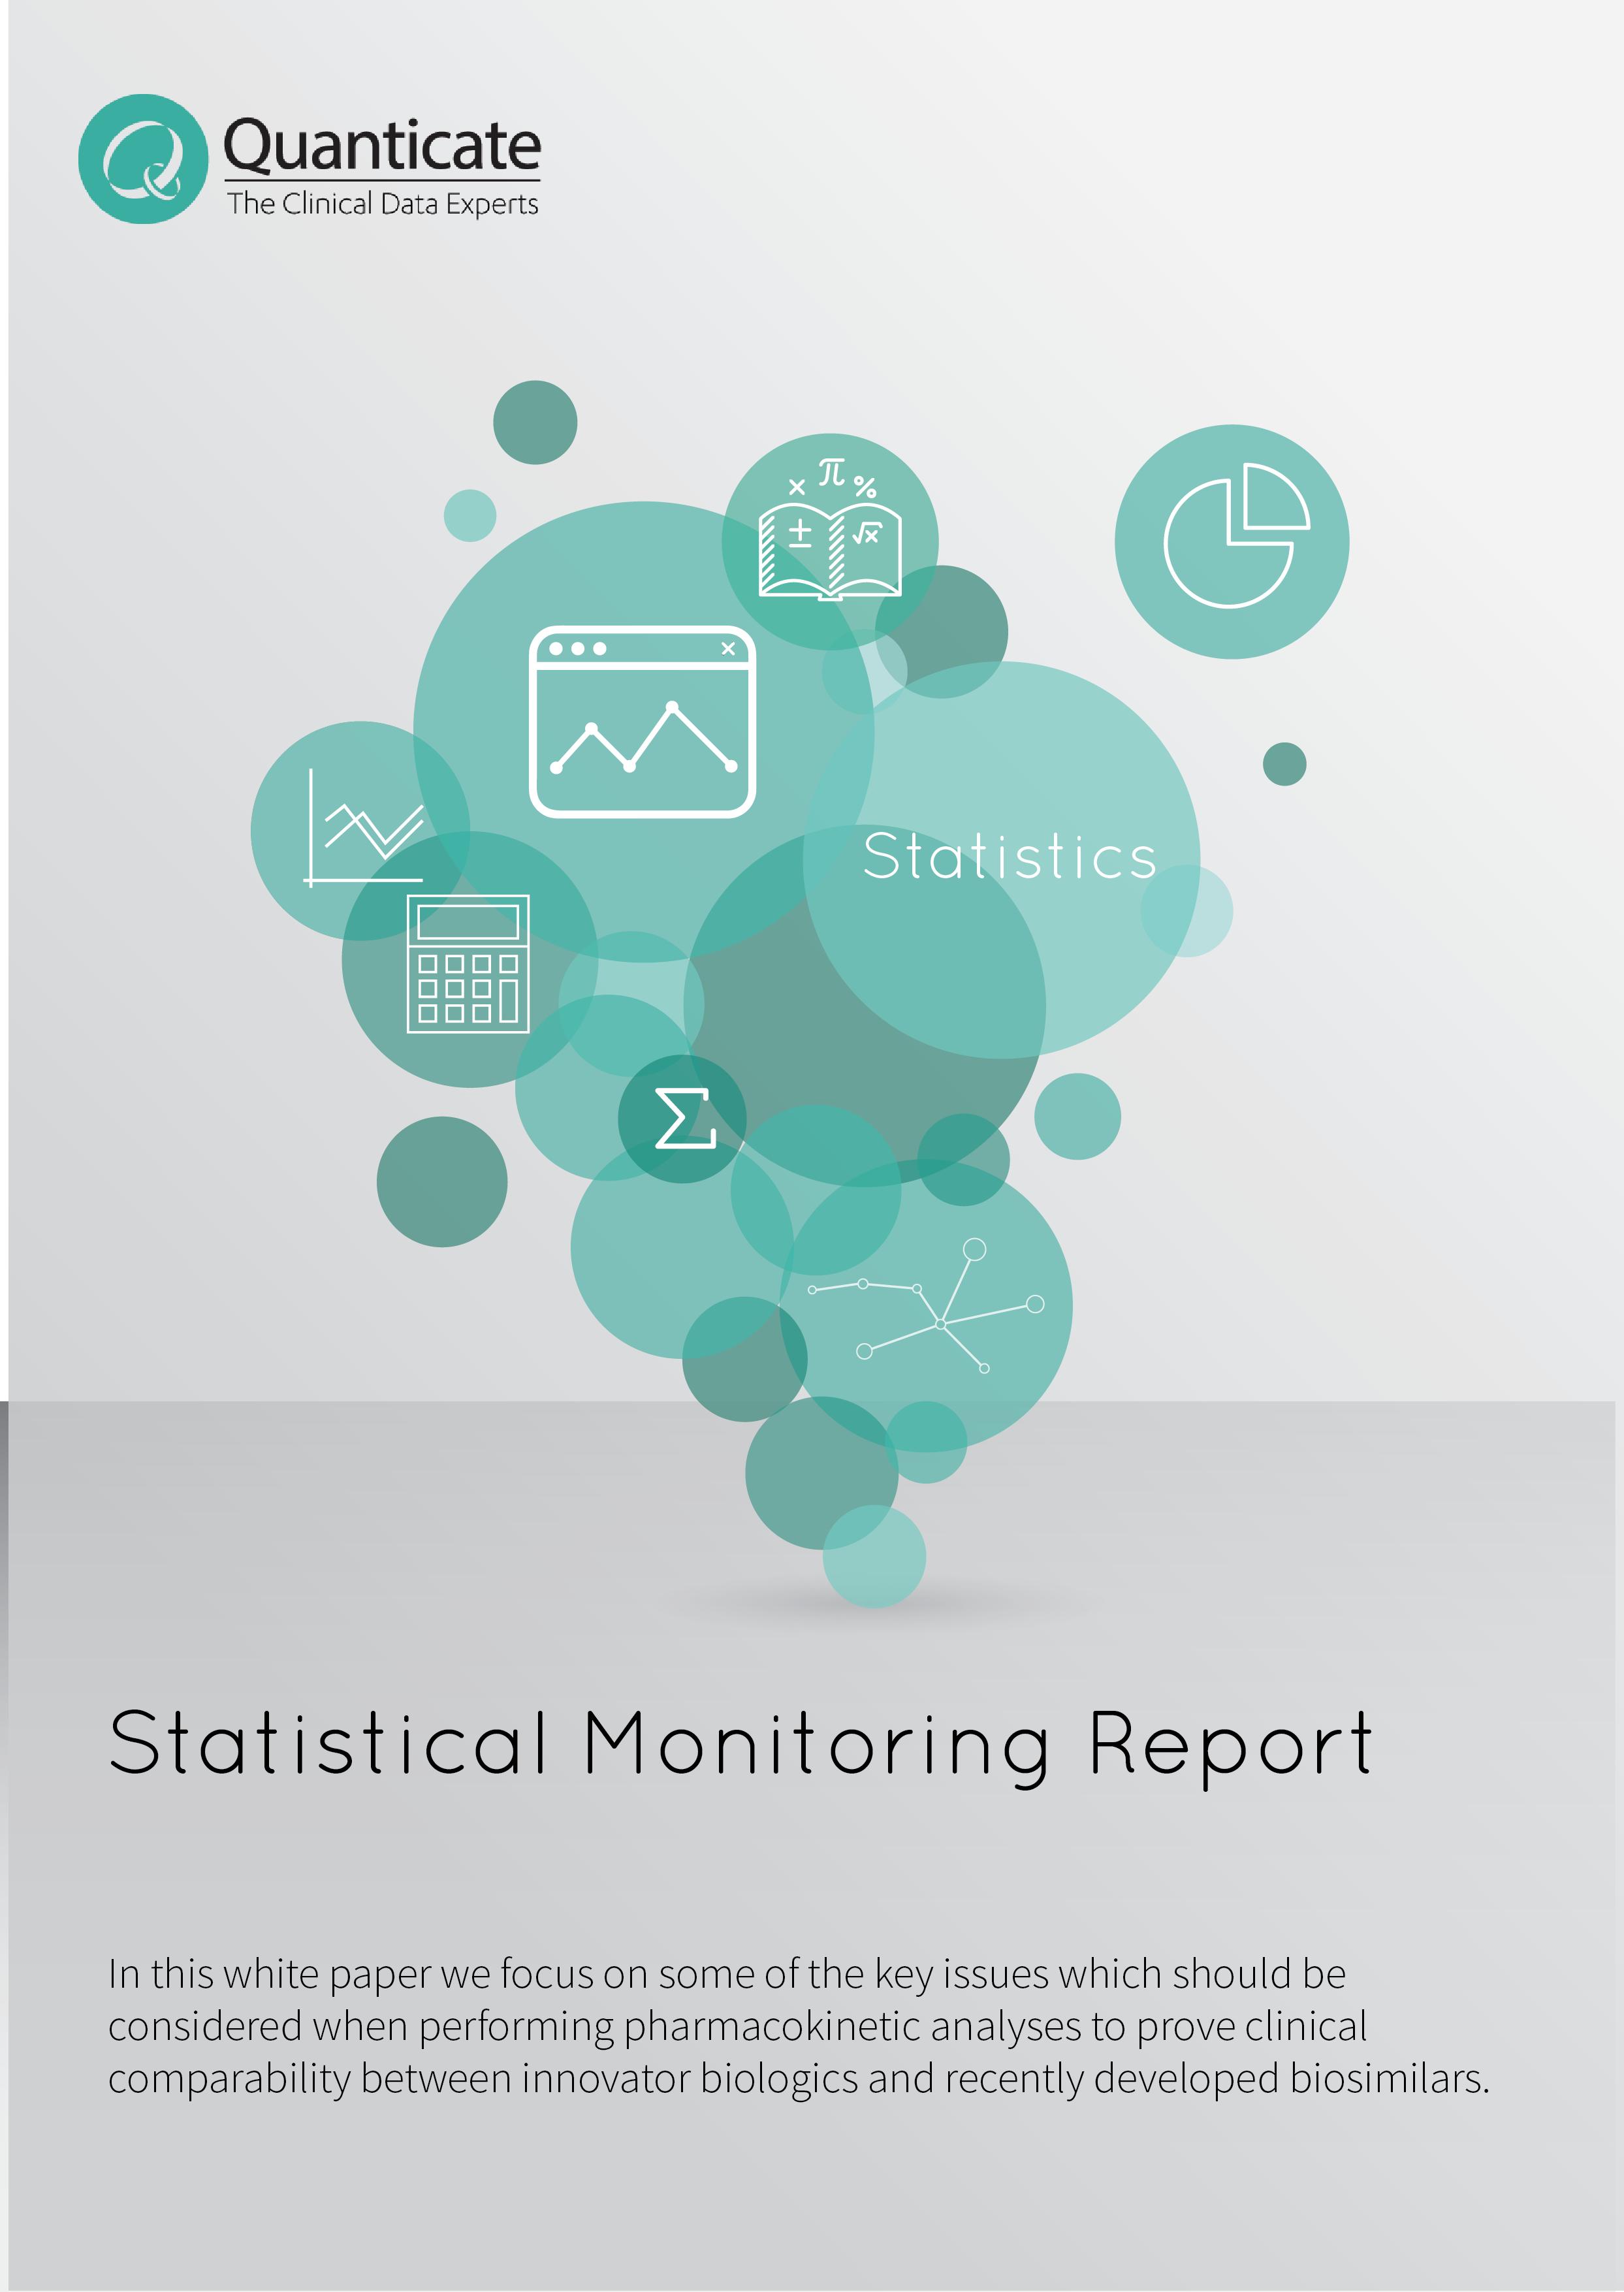 Statistical Monitoring